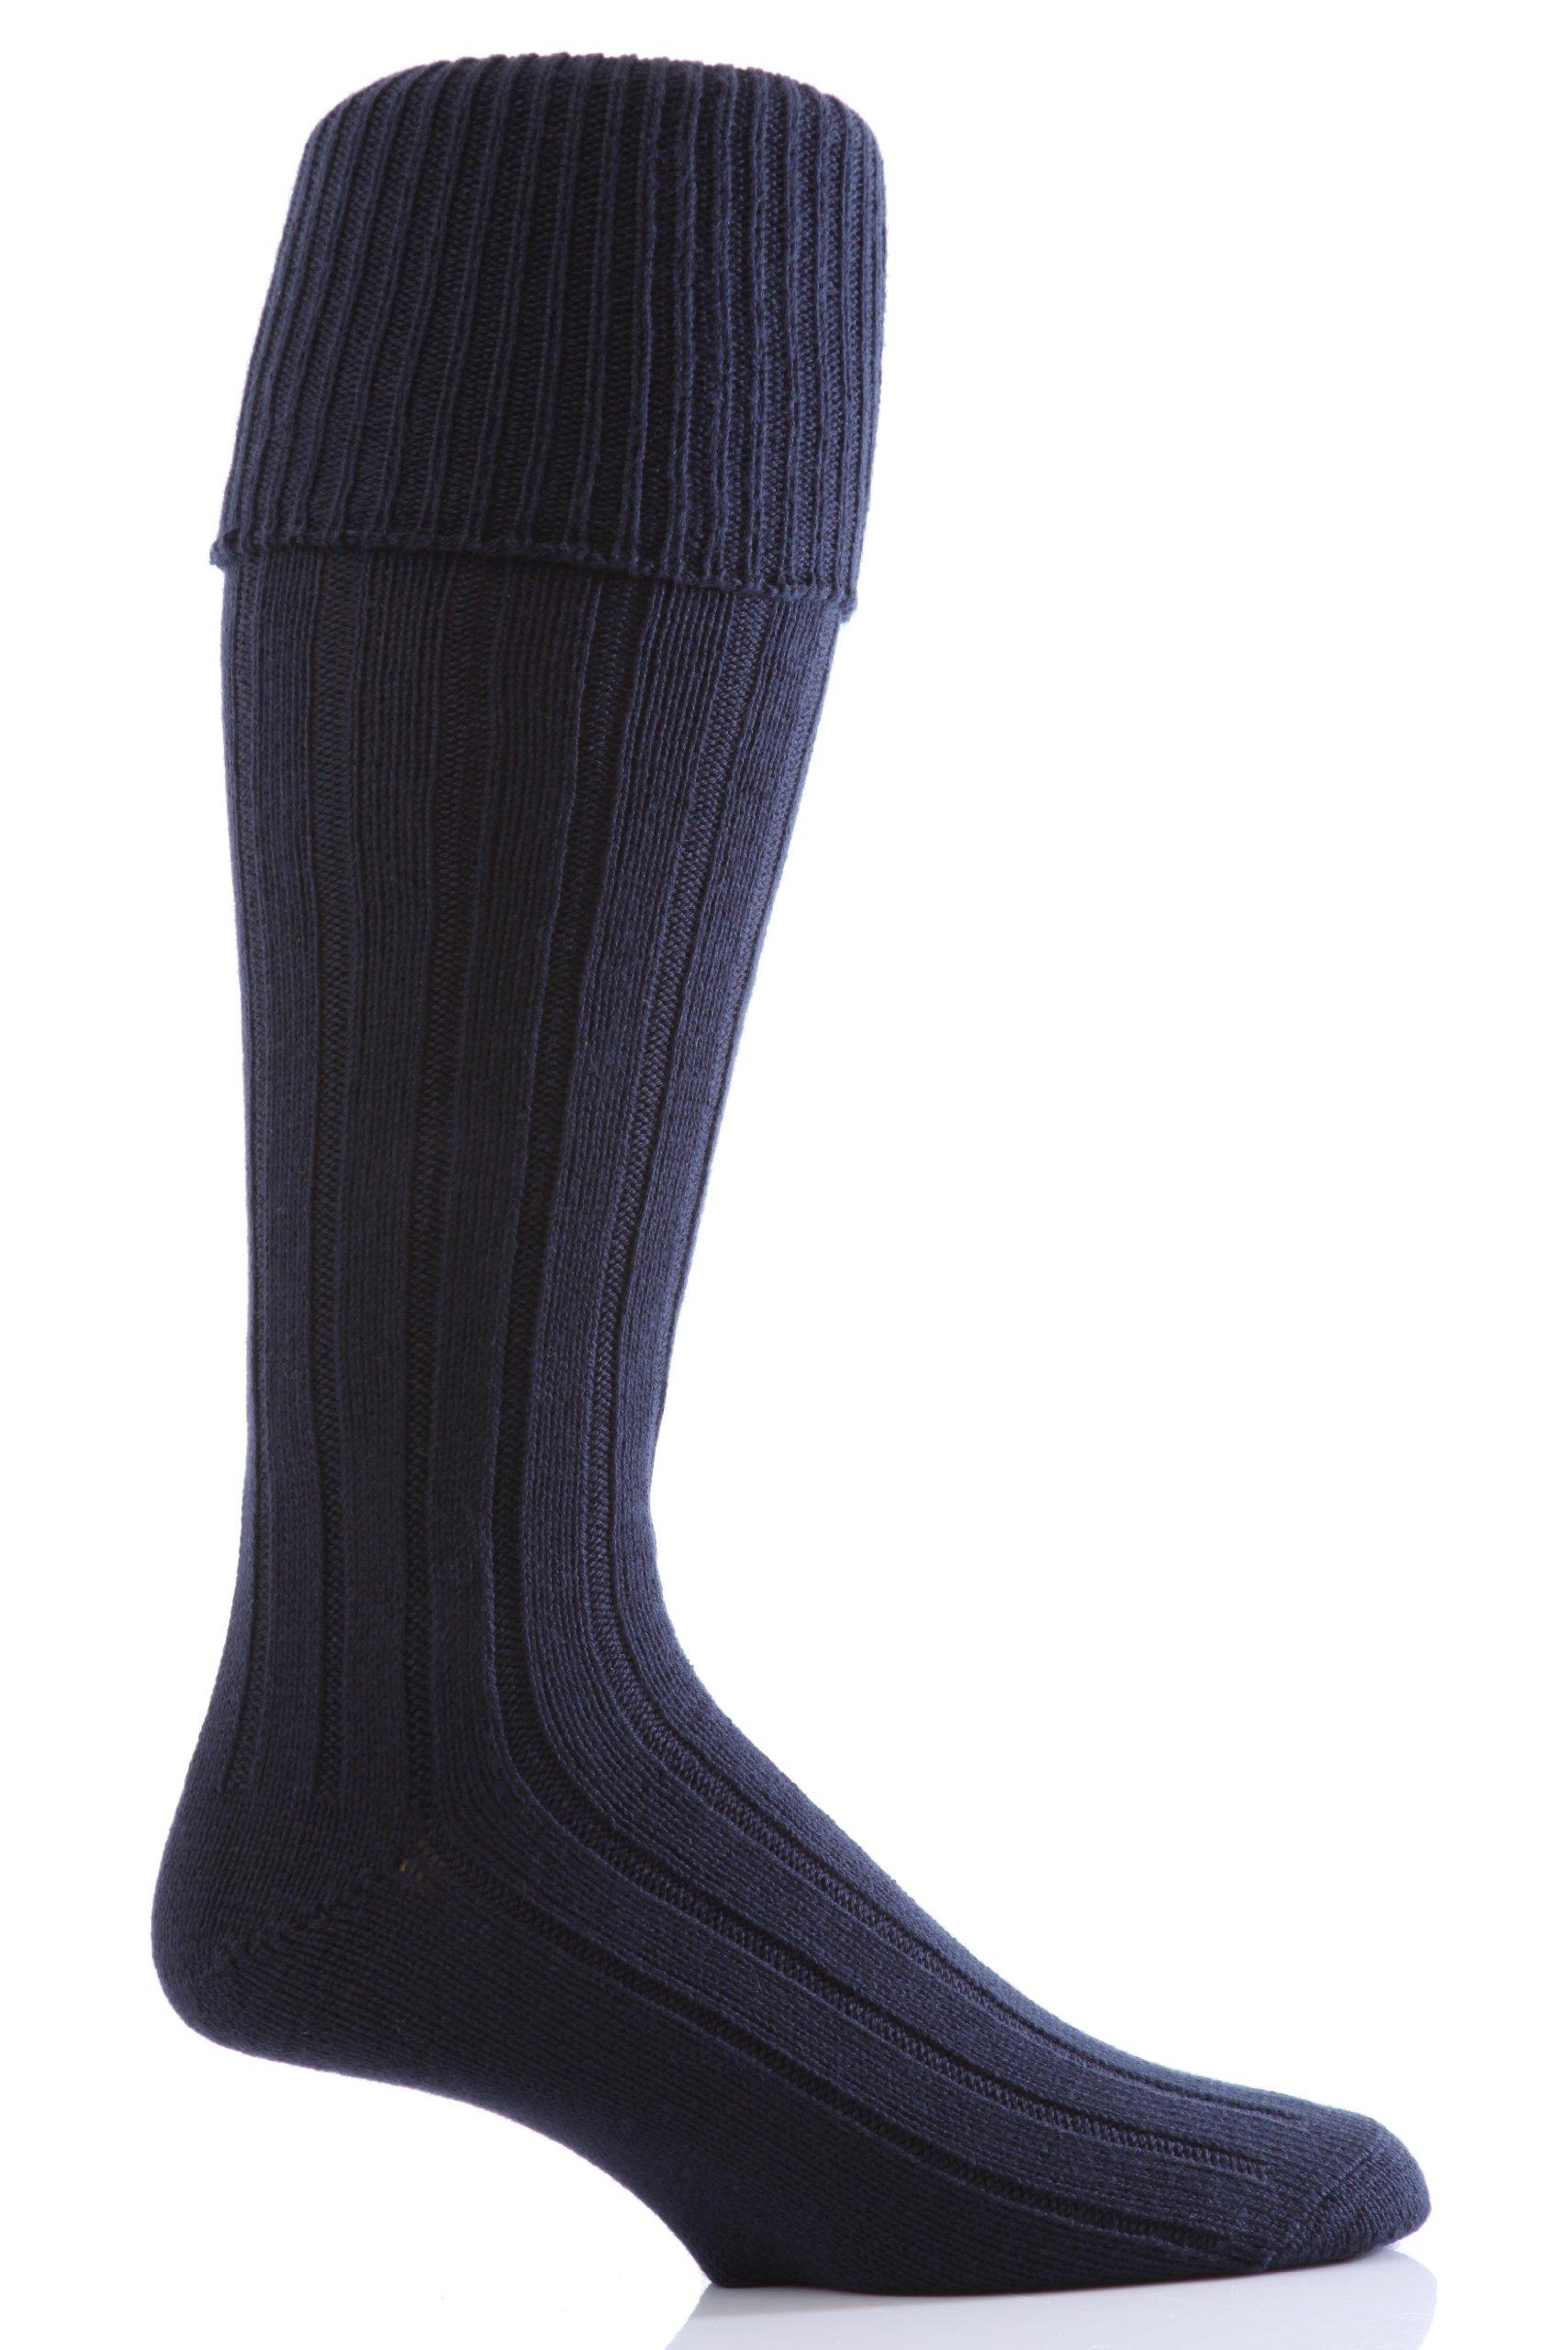 Glenmuir Men's 1 Pair Birkdale Golf Wool Knee High Socks with Turn Over Cuff 8-12 Navy by Glenmuir